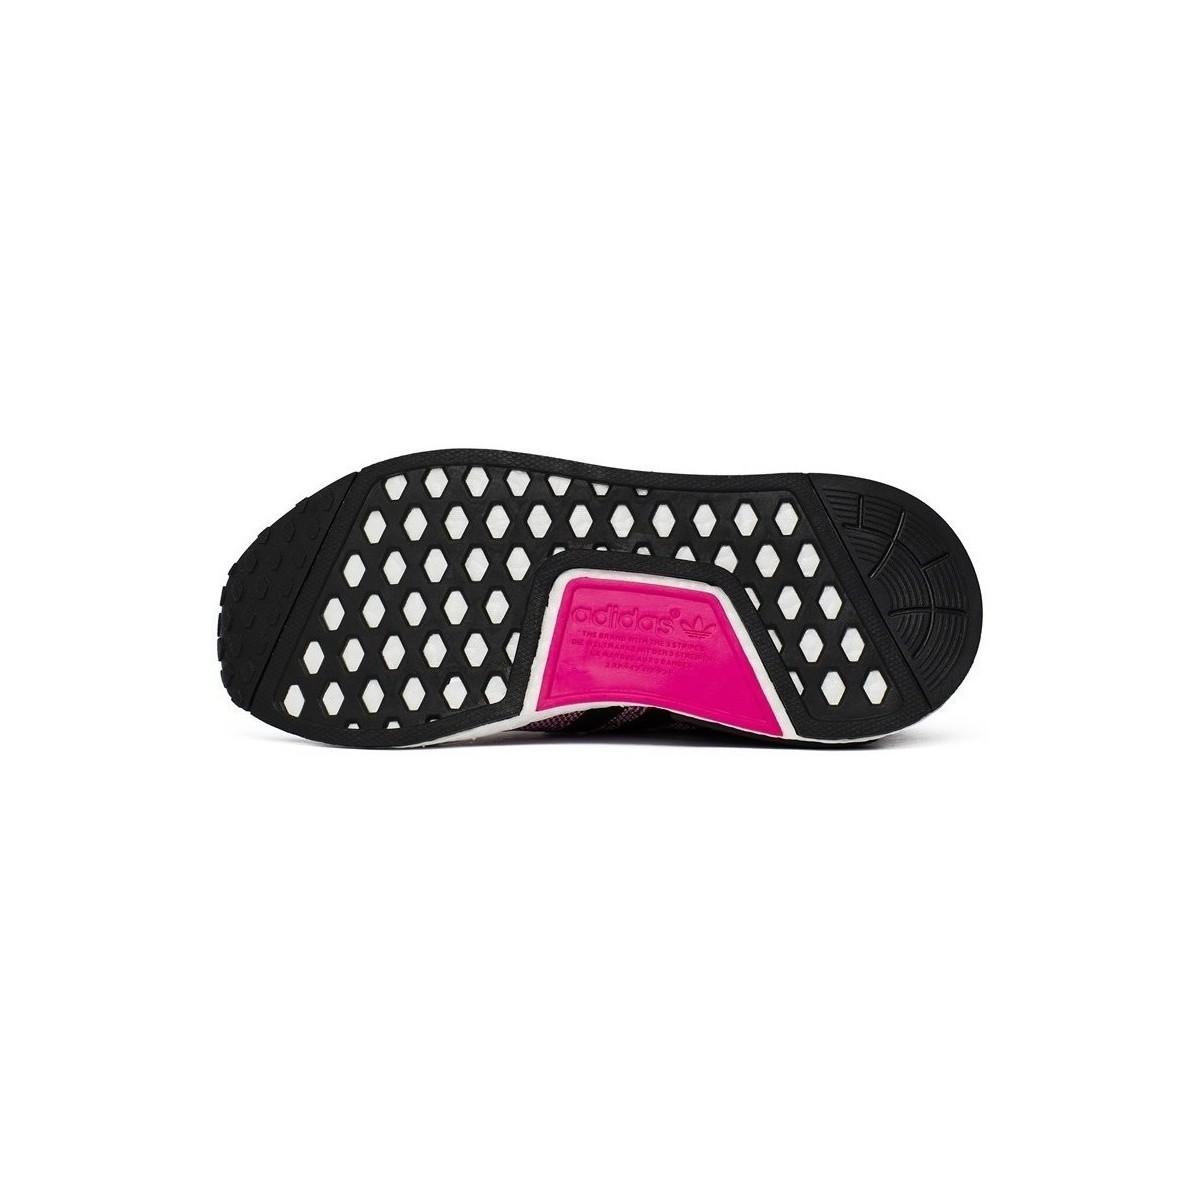 ba65e19fd adidas Nmd R1 Primeknit Women Shock Pink Women s Shoes (trainers) In ...